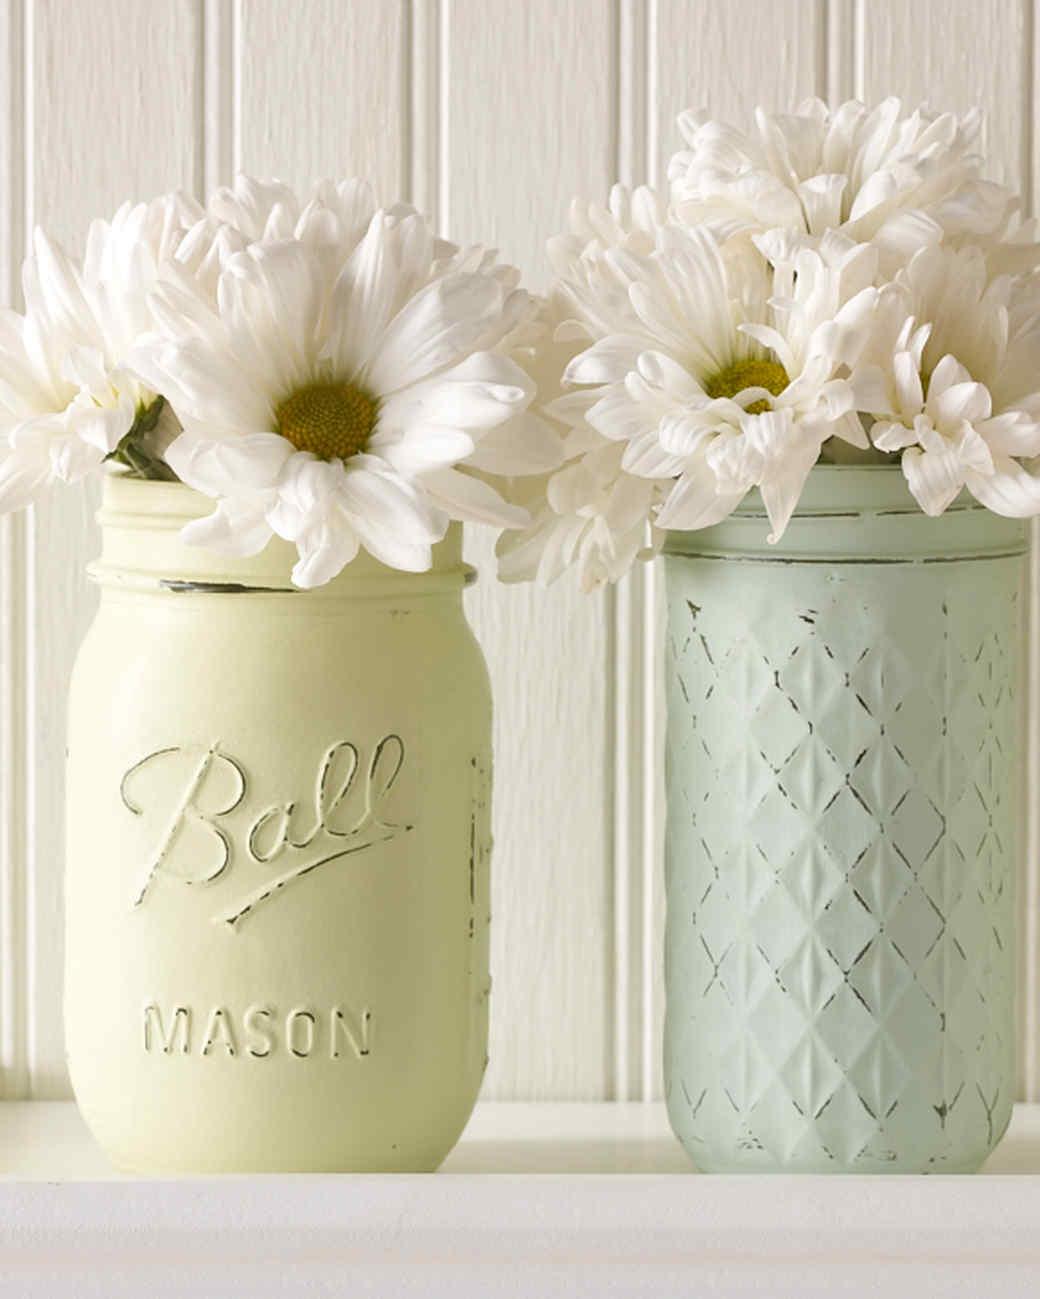 mason jars turned vintage decor vases martha stewart. Black Bedroom Furniture Sets. Home Design Ideas